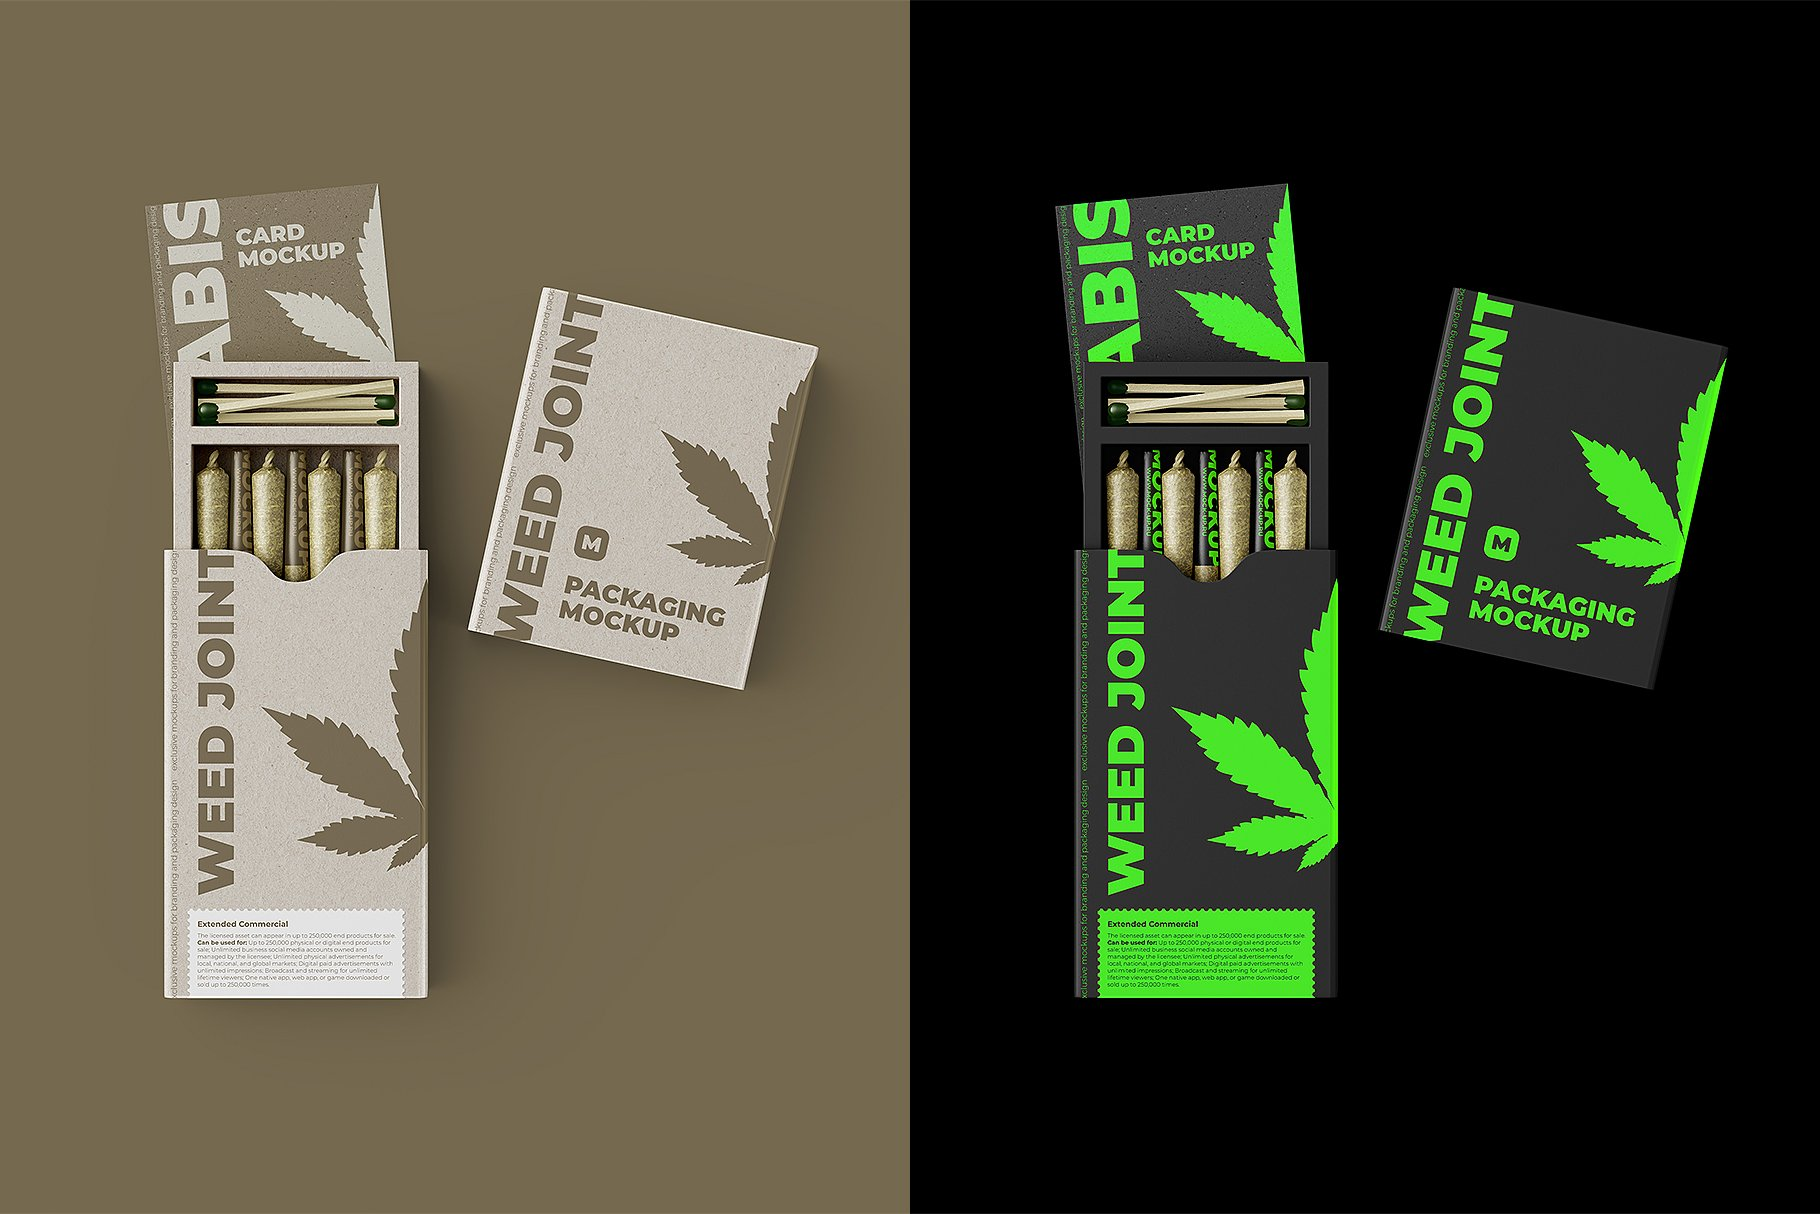 烟草香烟雪茄包装纸盒设计展示贴图样机 Weed Joint Packaging Mockup插图8